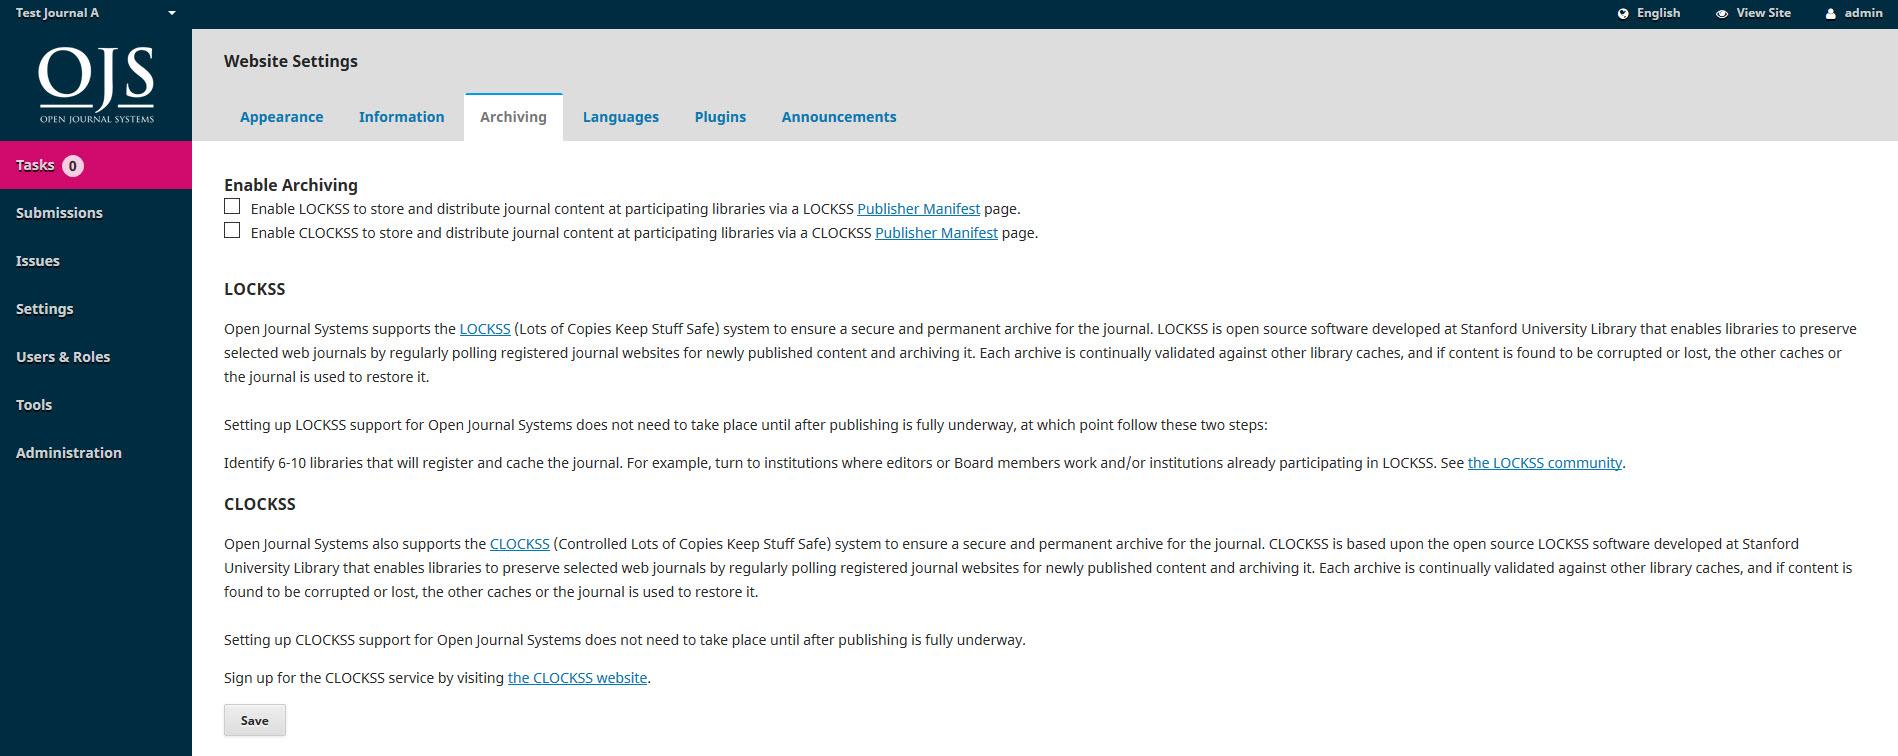 ojs3-website-settings-archiving